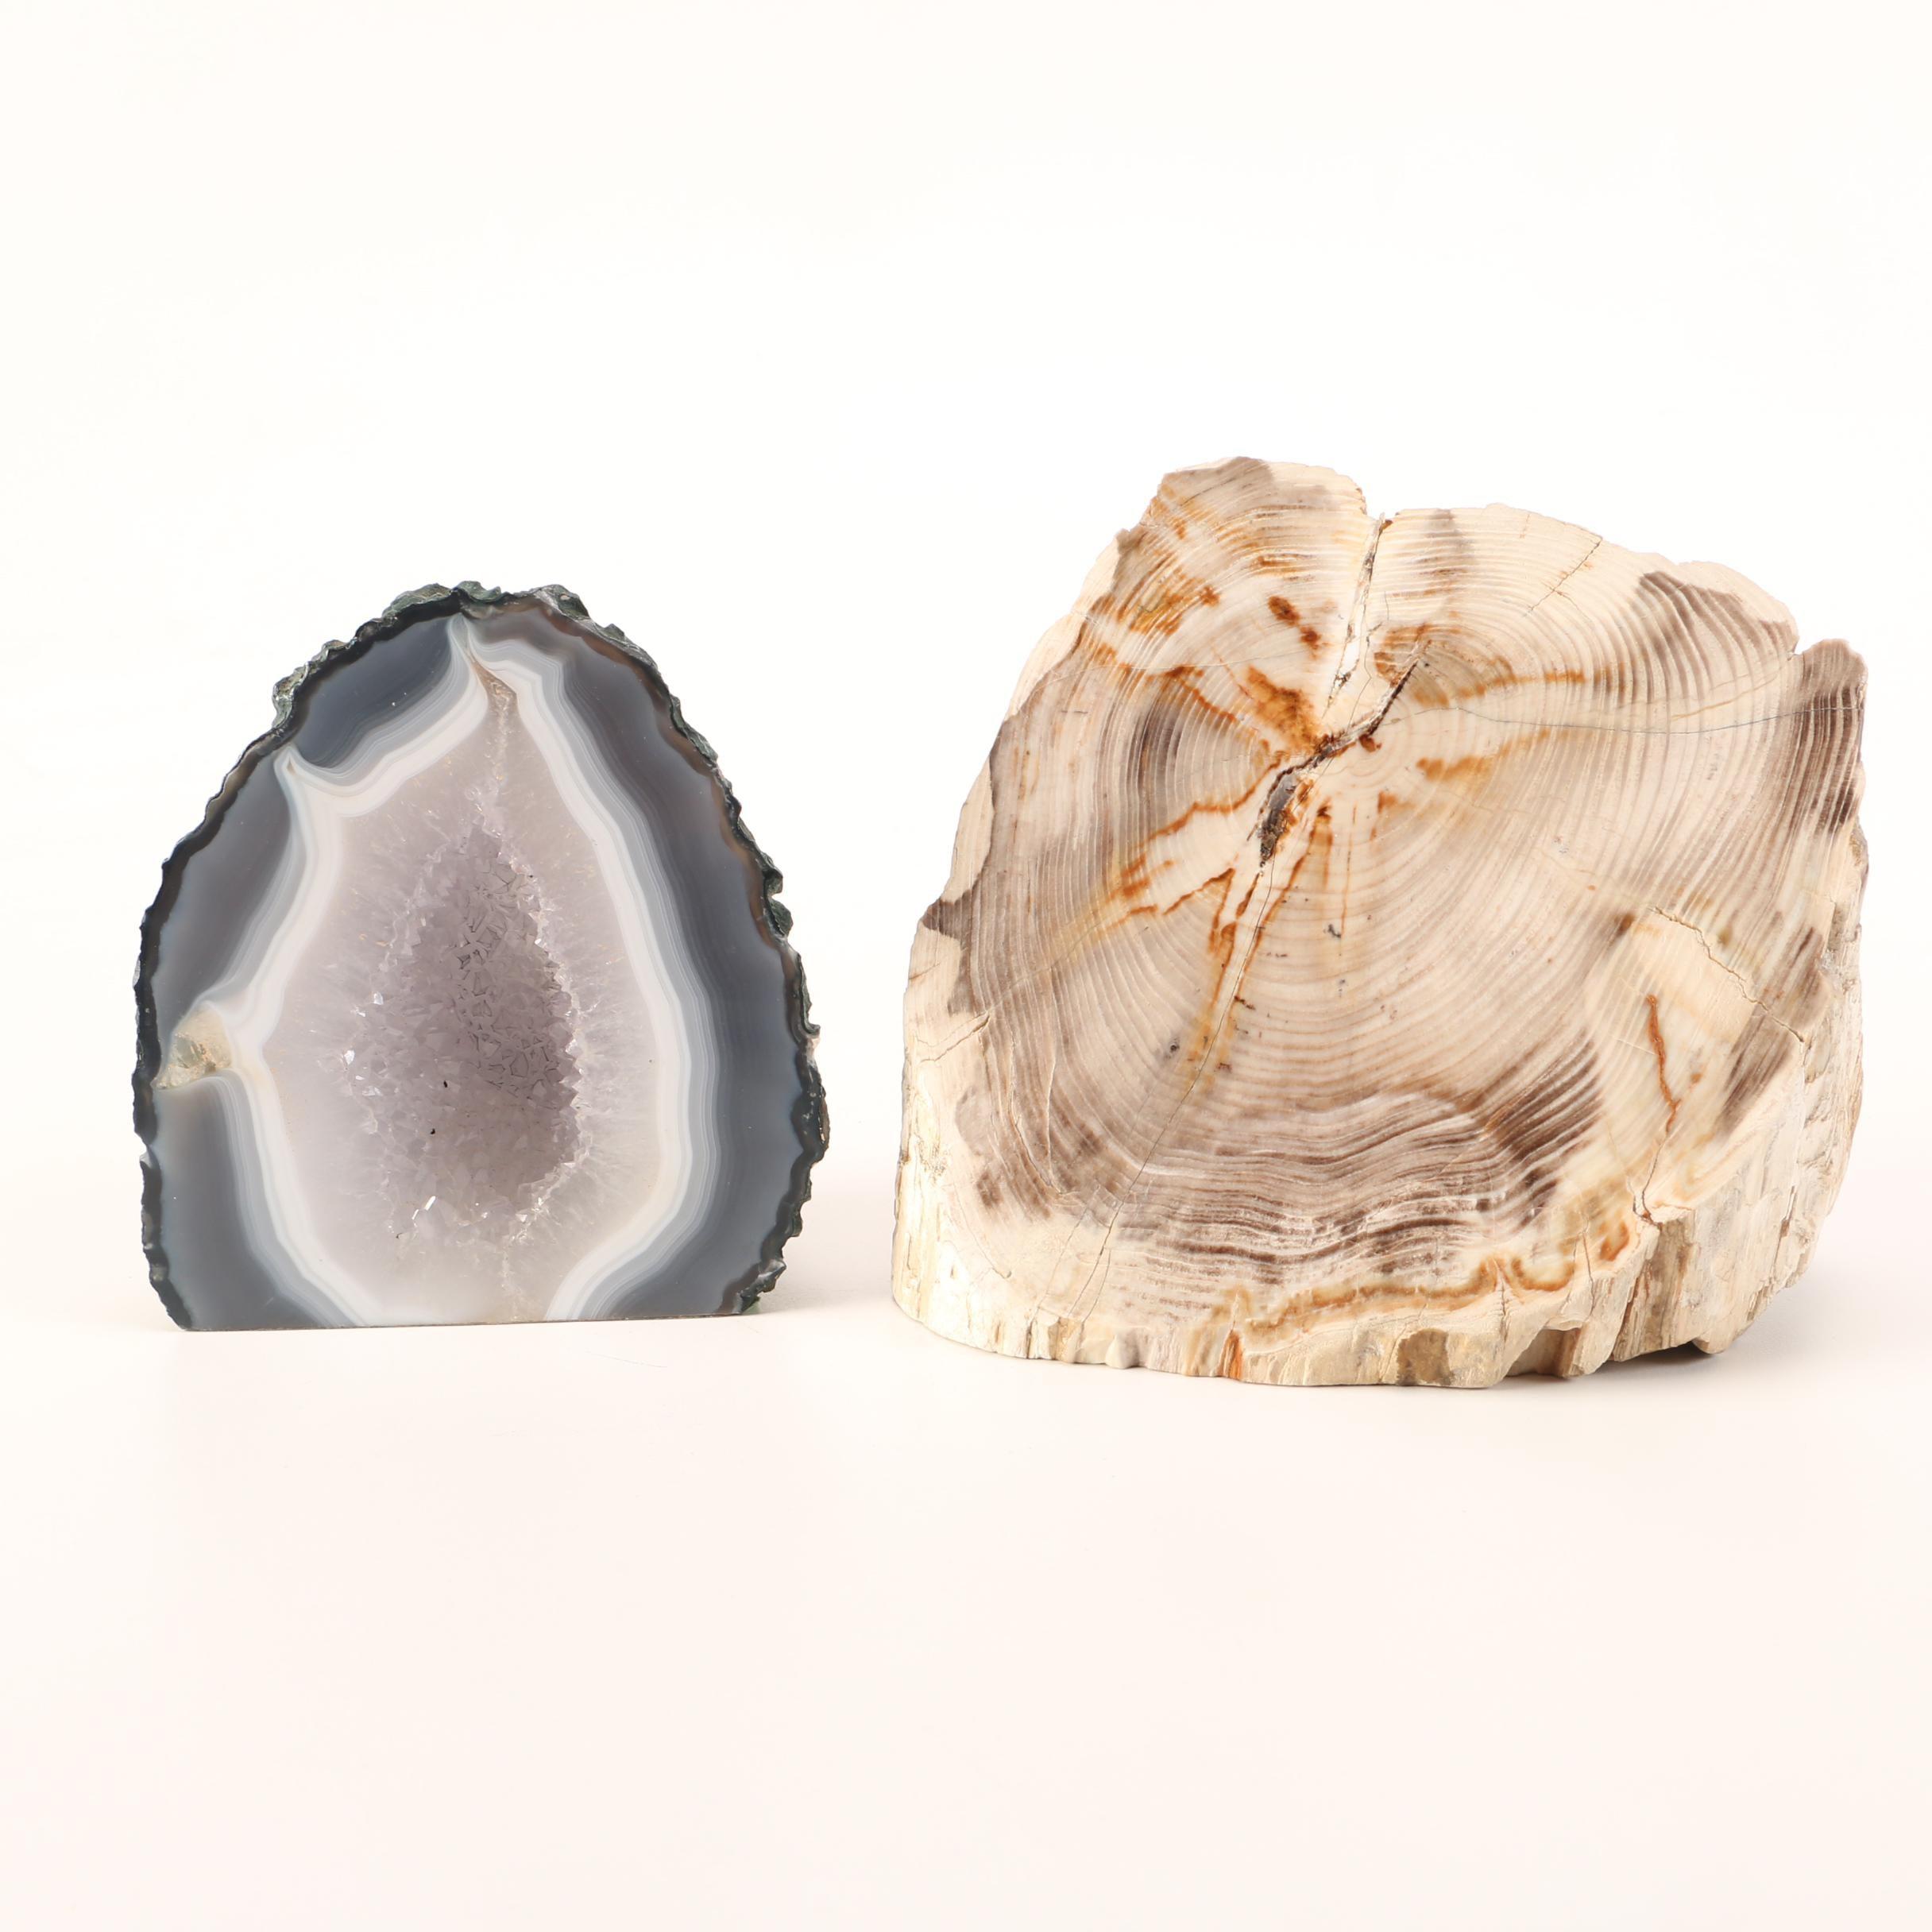 Petrified Wood and Geode